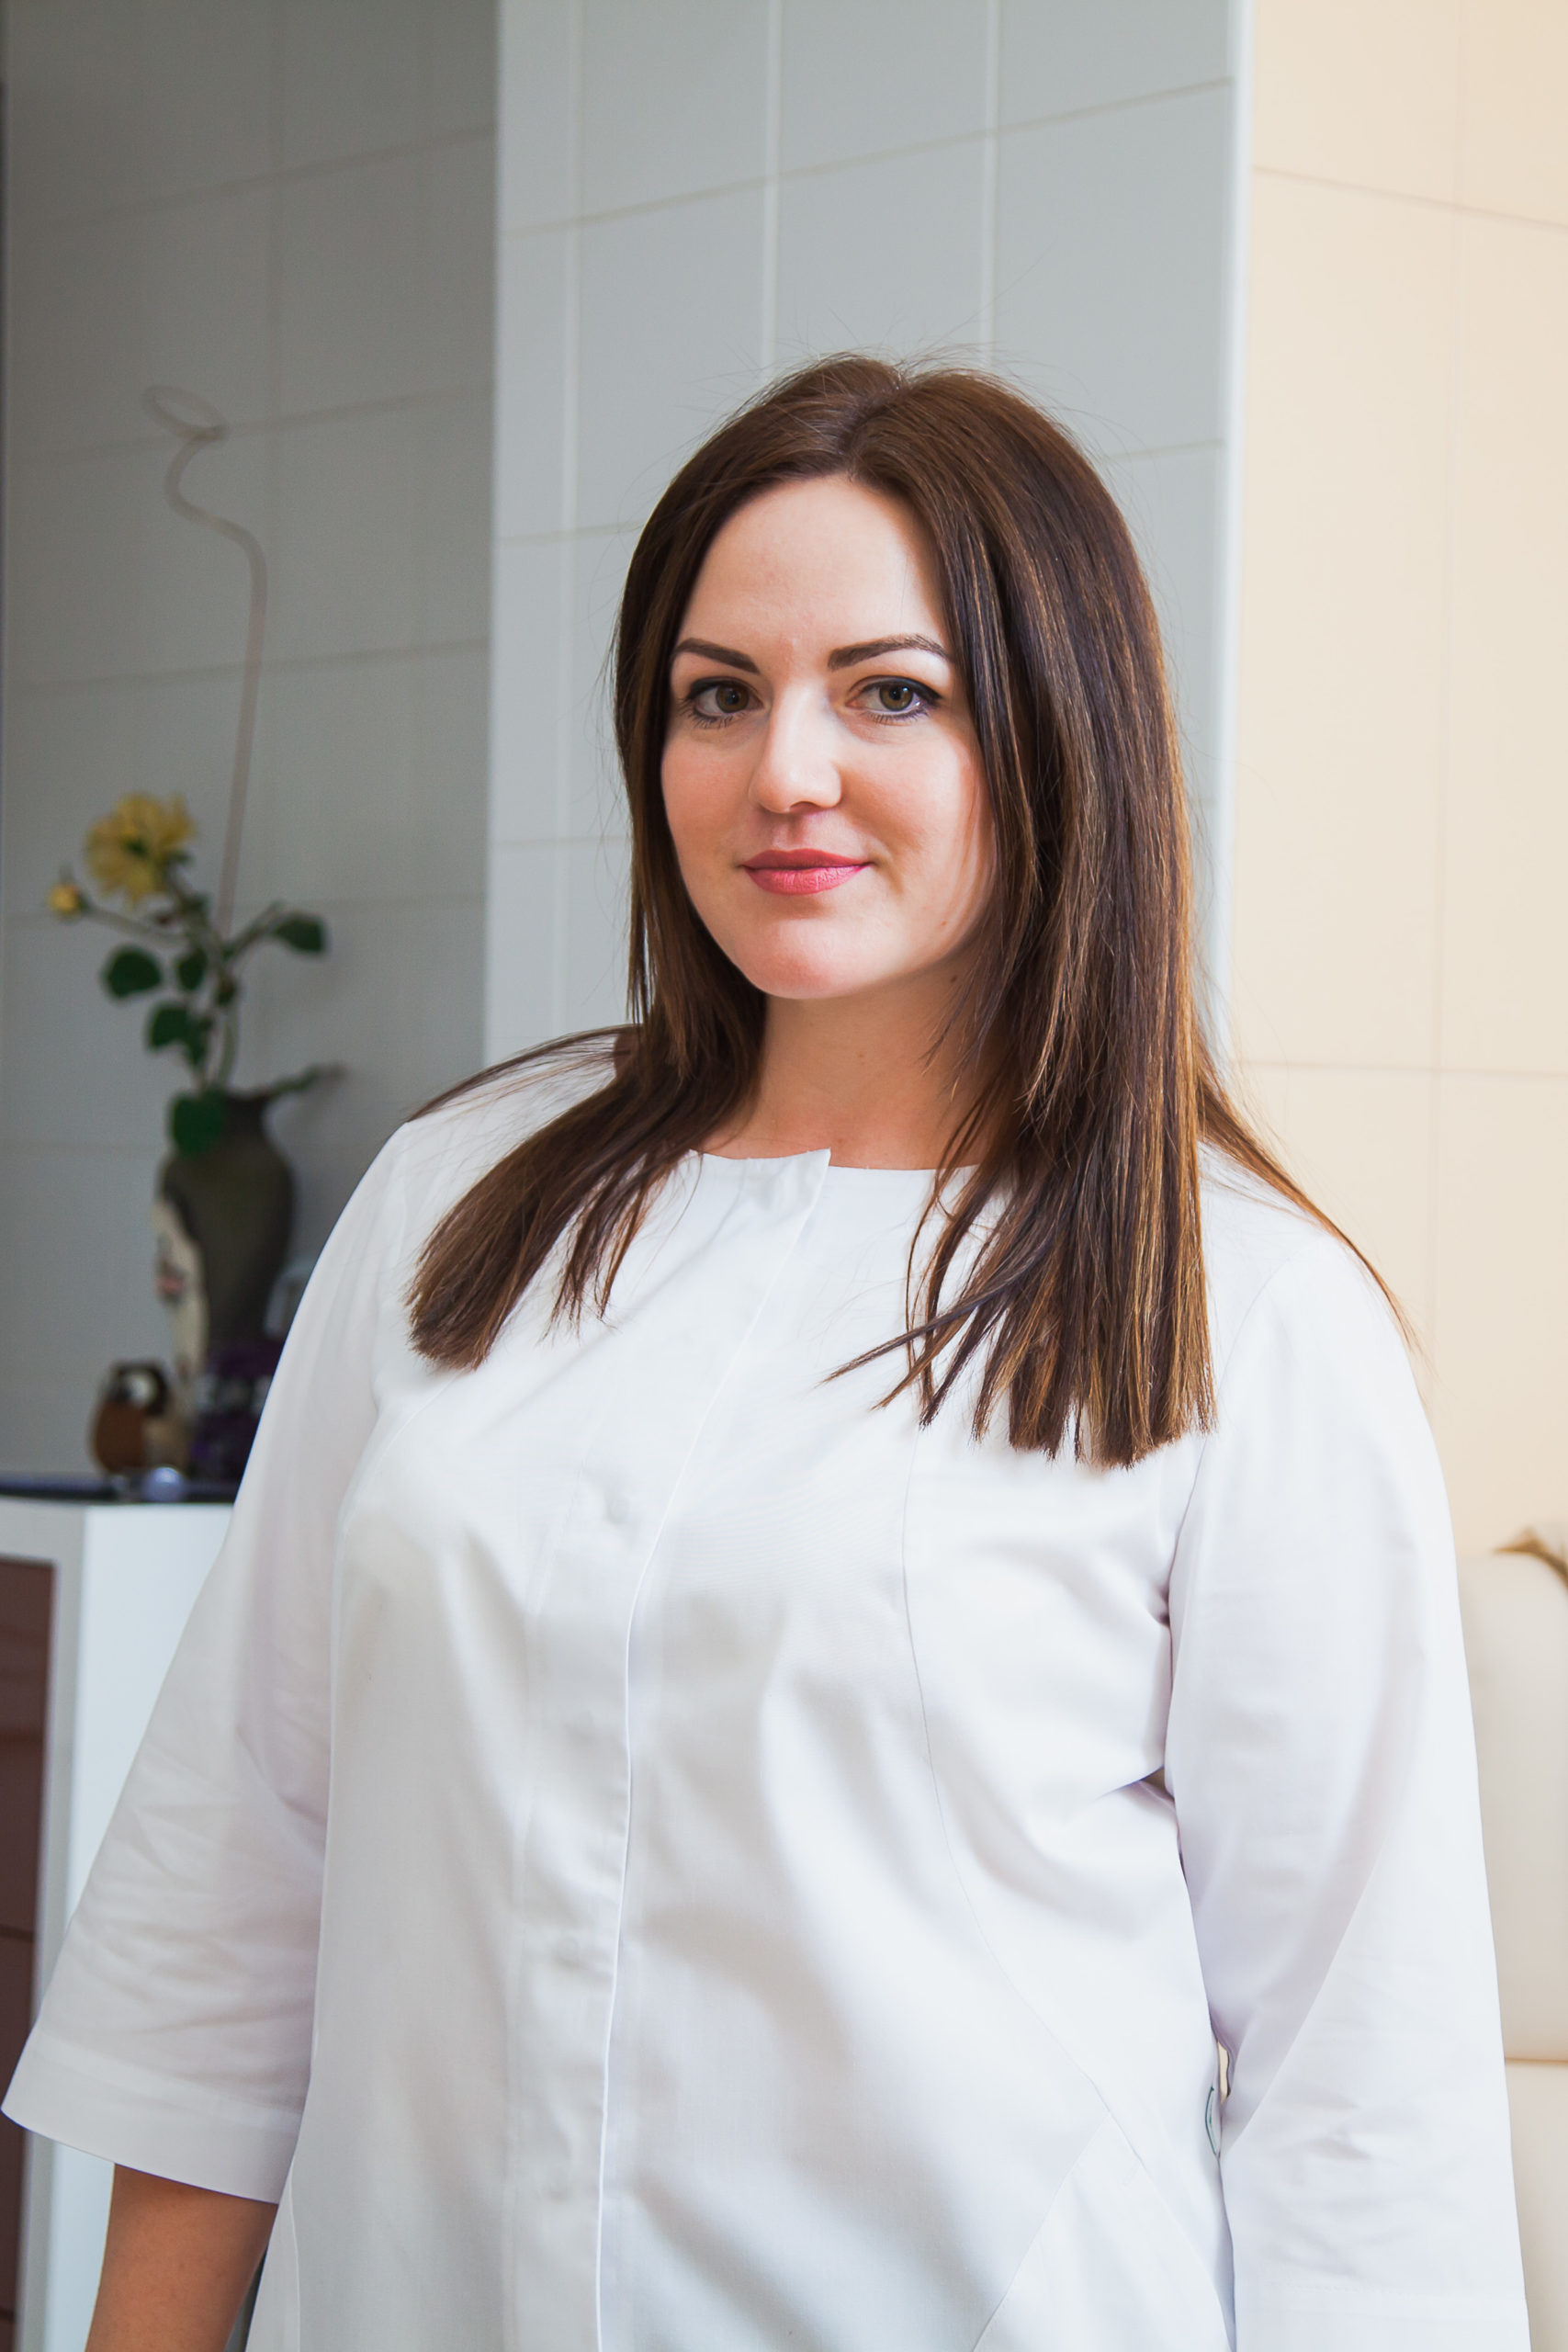 bulatova2 scaled - Булатова Диана Ринатовна